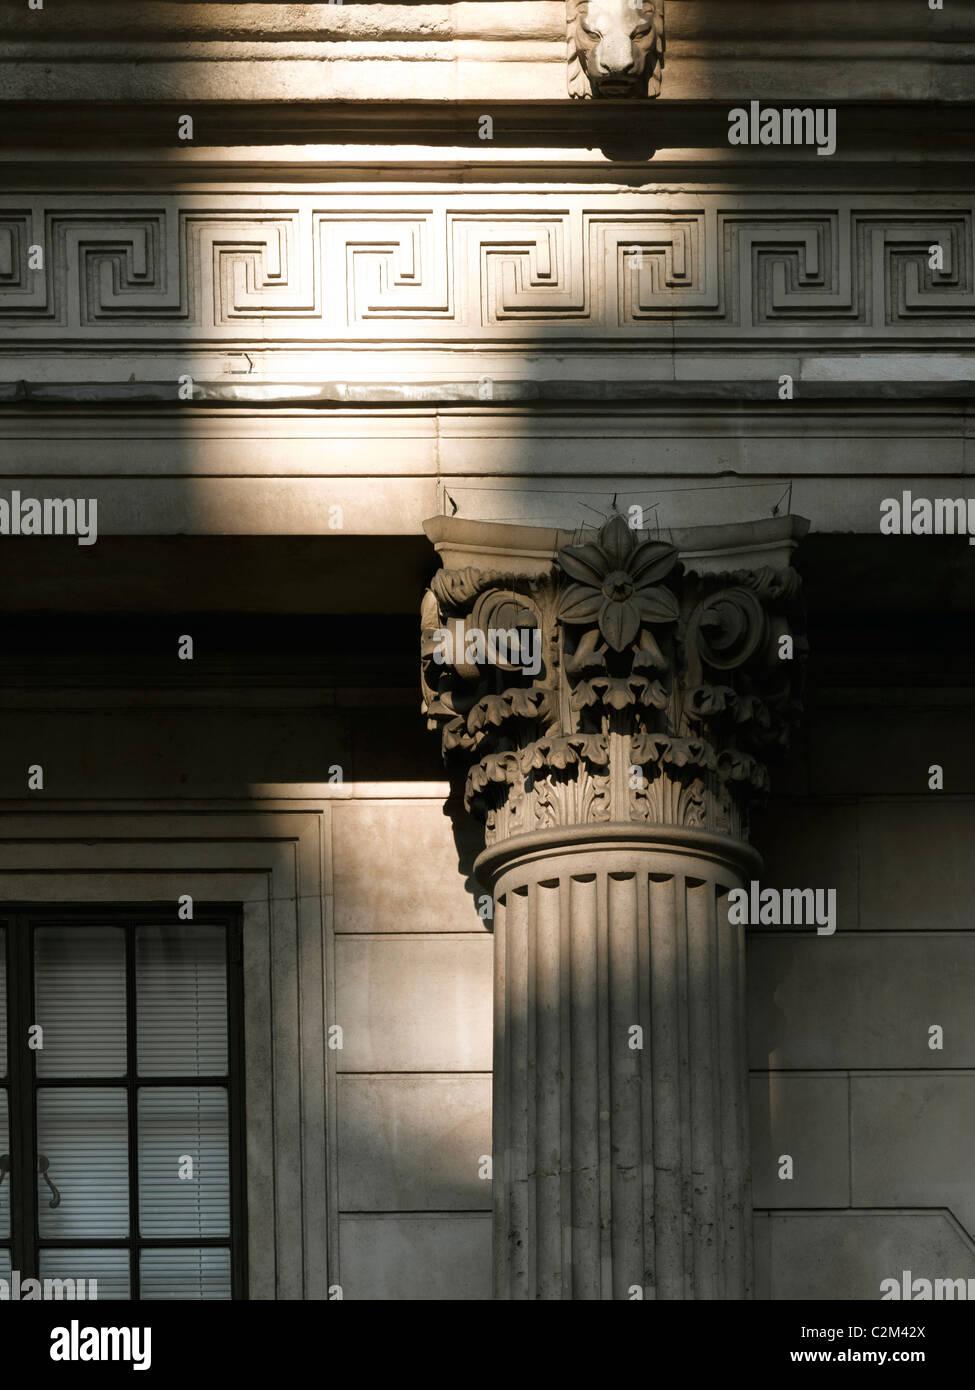 Doric column, Bank of England, Threadneedle Street, City of London. - Stock Image